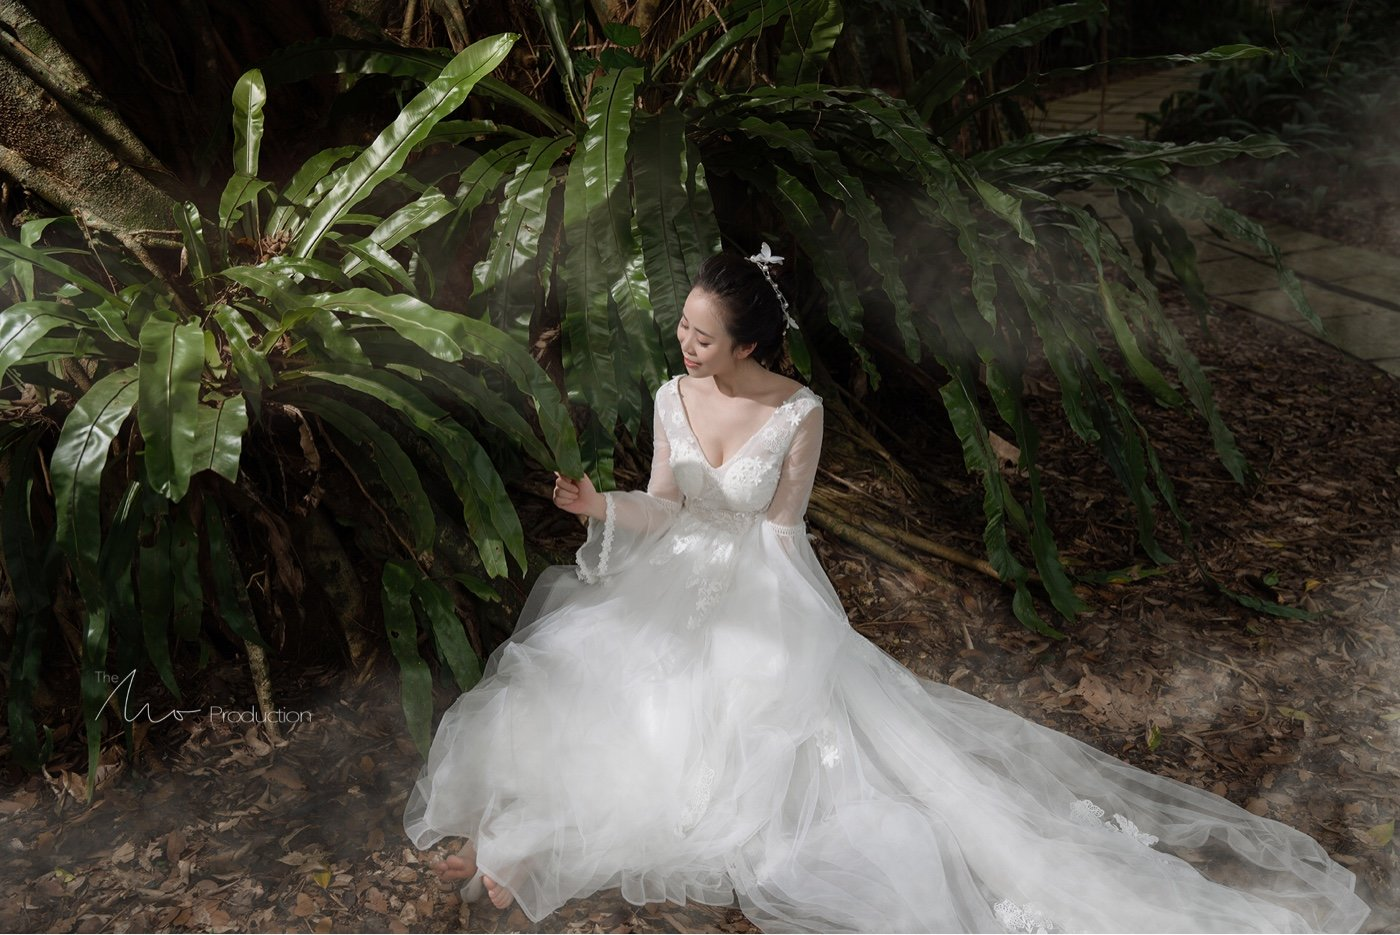 MoFoTo | 新加坡旅拍婚纱7